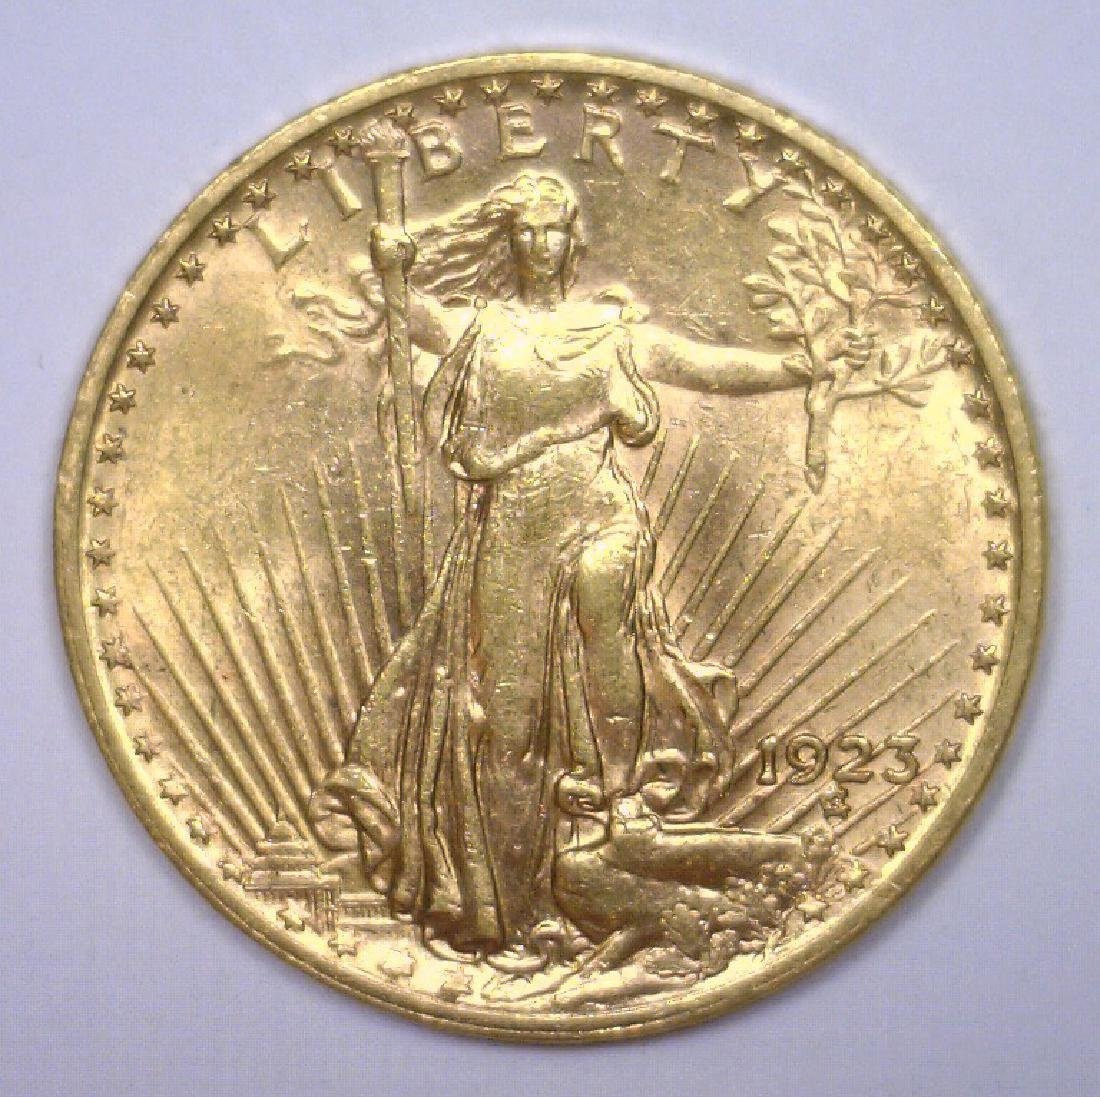 1923 $20 St. Gaudens Gold Double Eagle BU